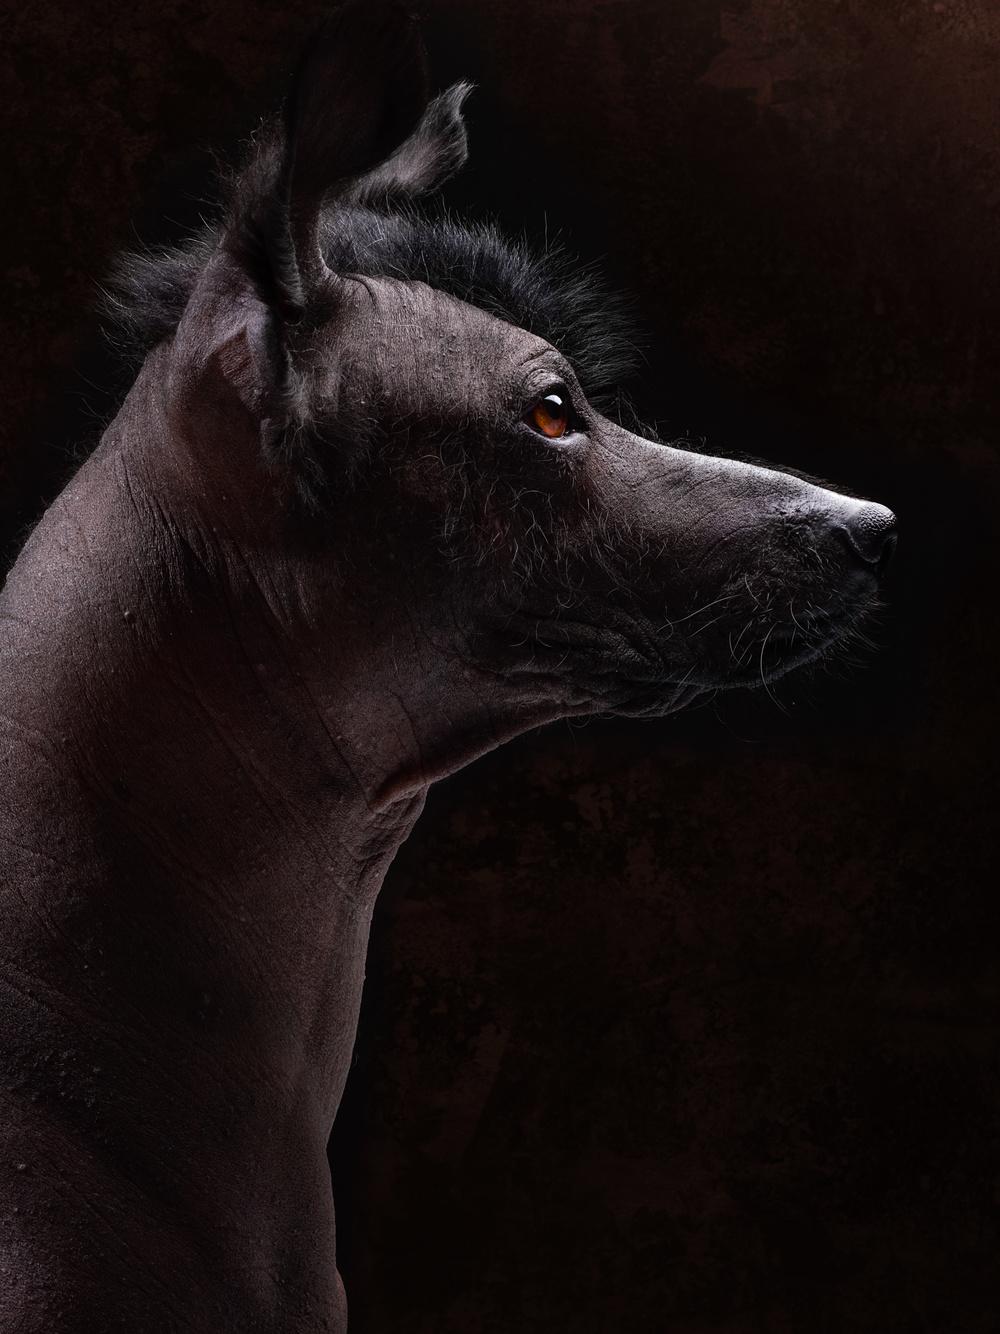 naked-dogs-klausdyba-29.jpg